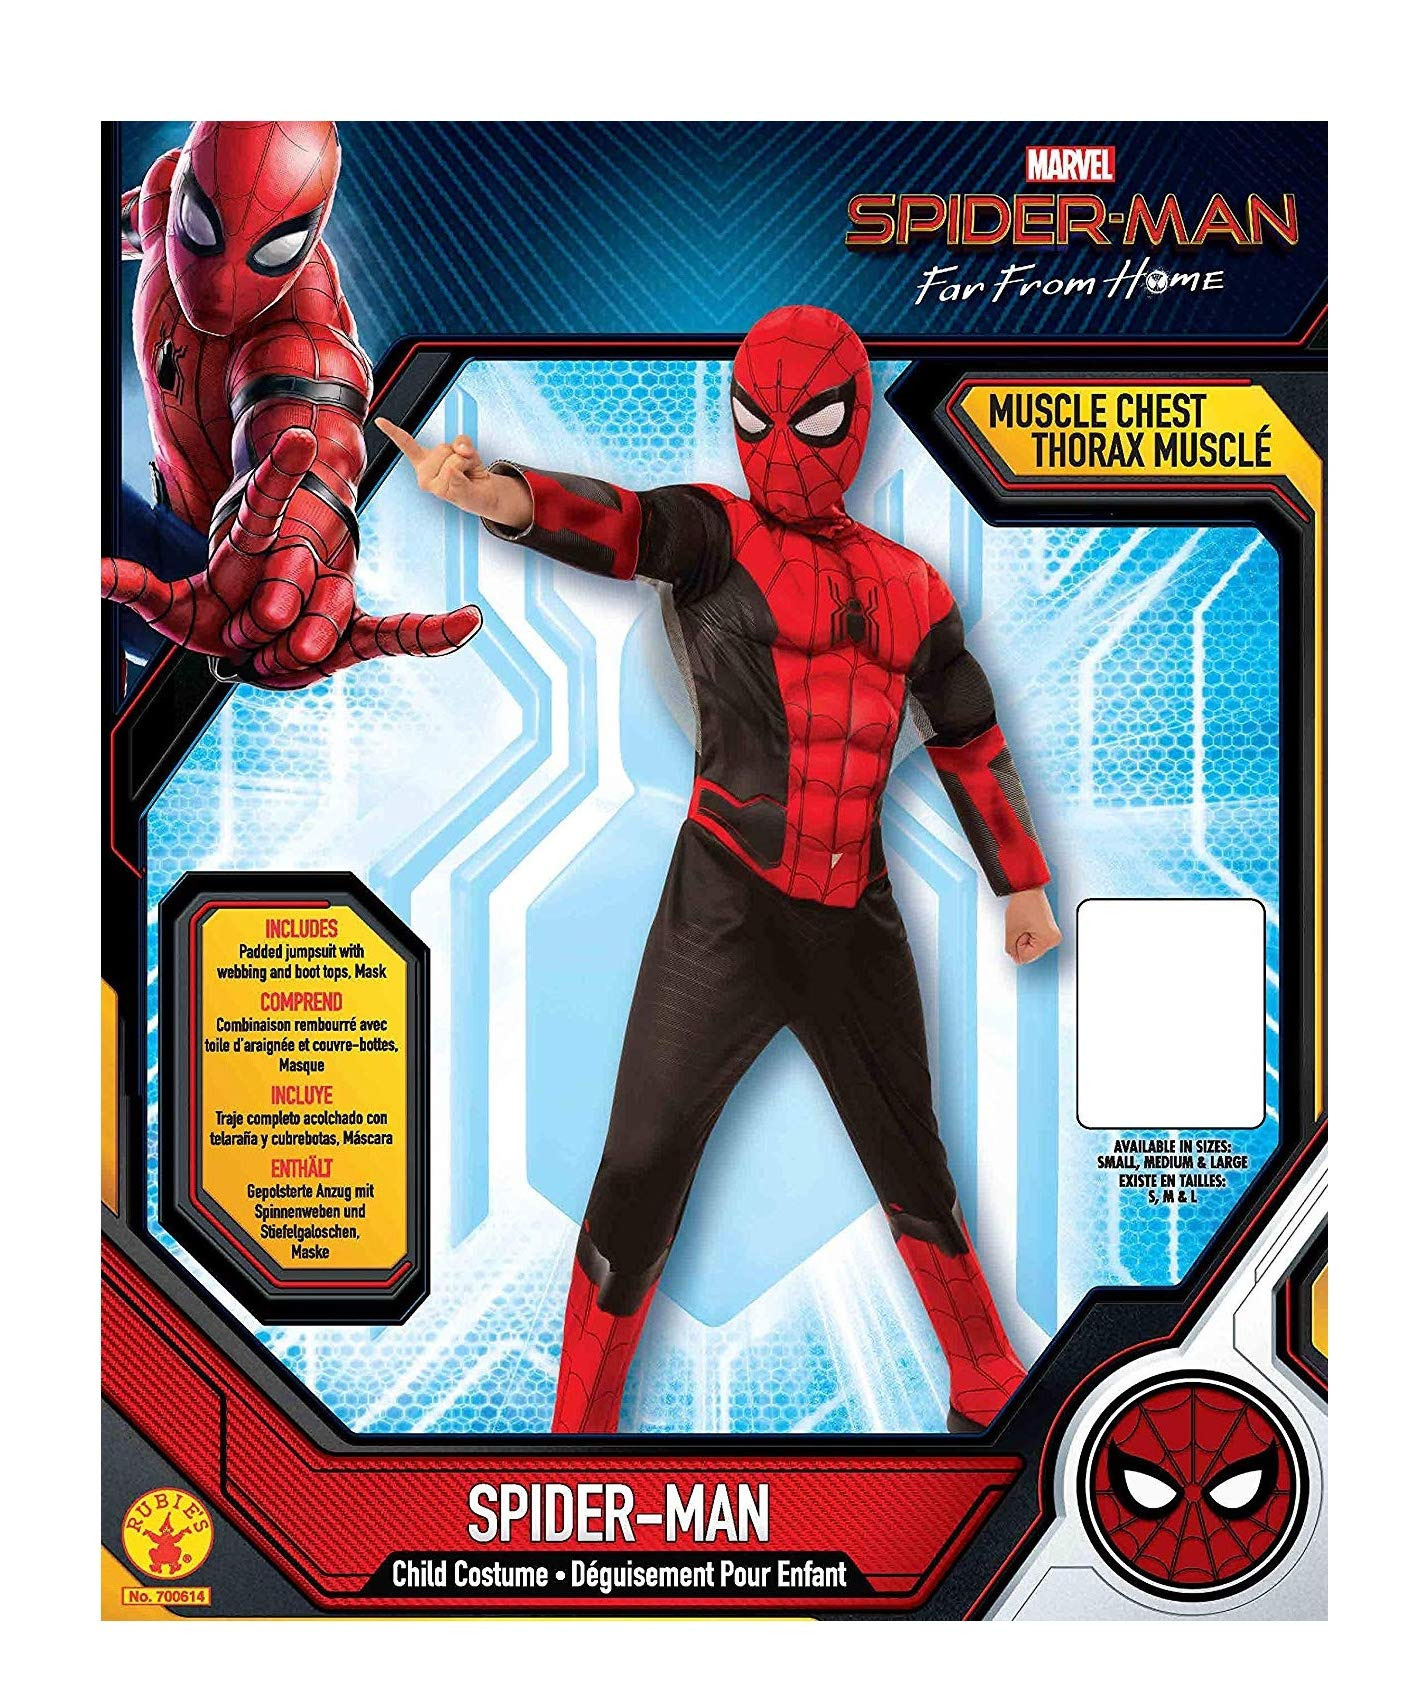 Marvel/'s spider-man-Far from Home-Stealth costume enfant costume